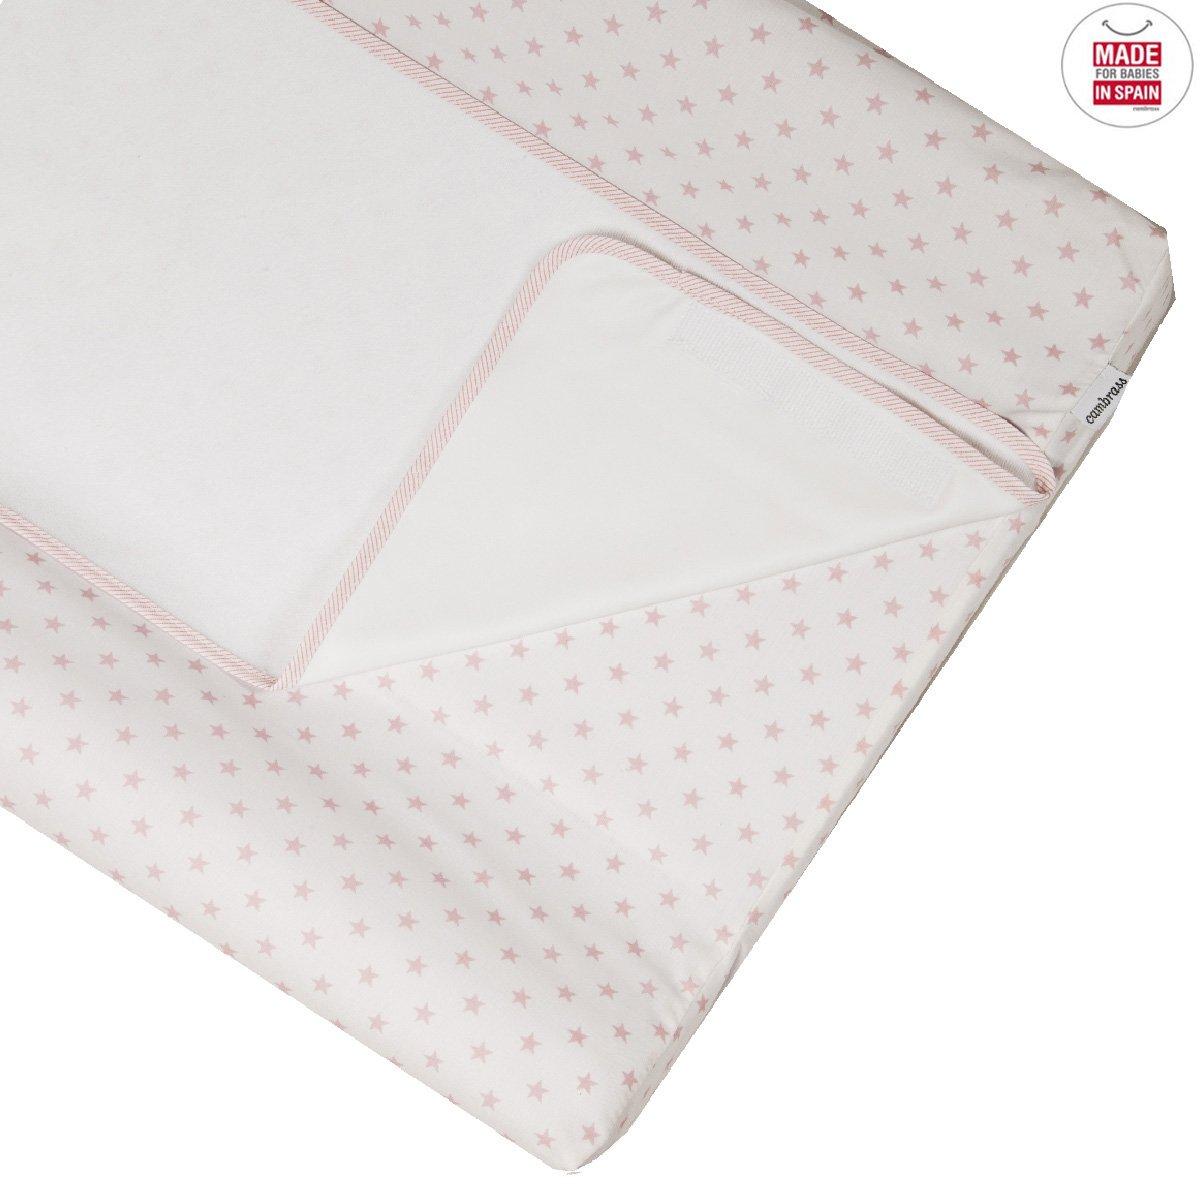 42 x 70 cm Cambrass Star color rosa Cambiador ba/ñera combi